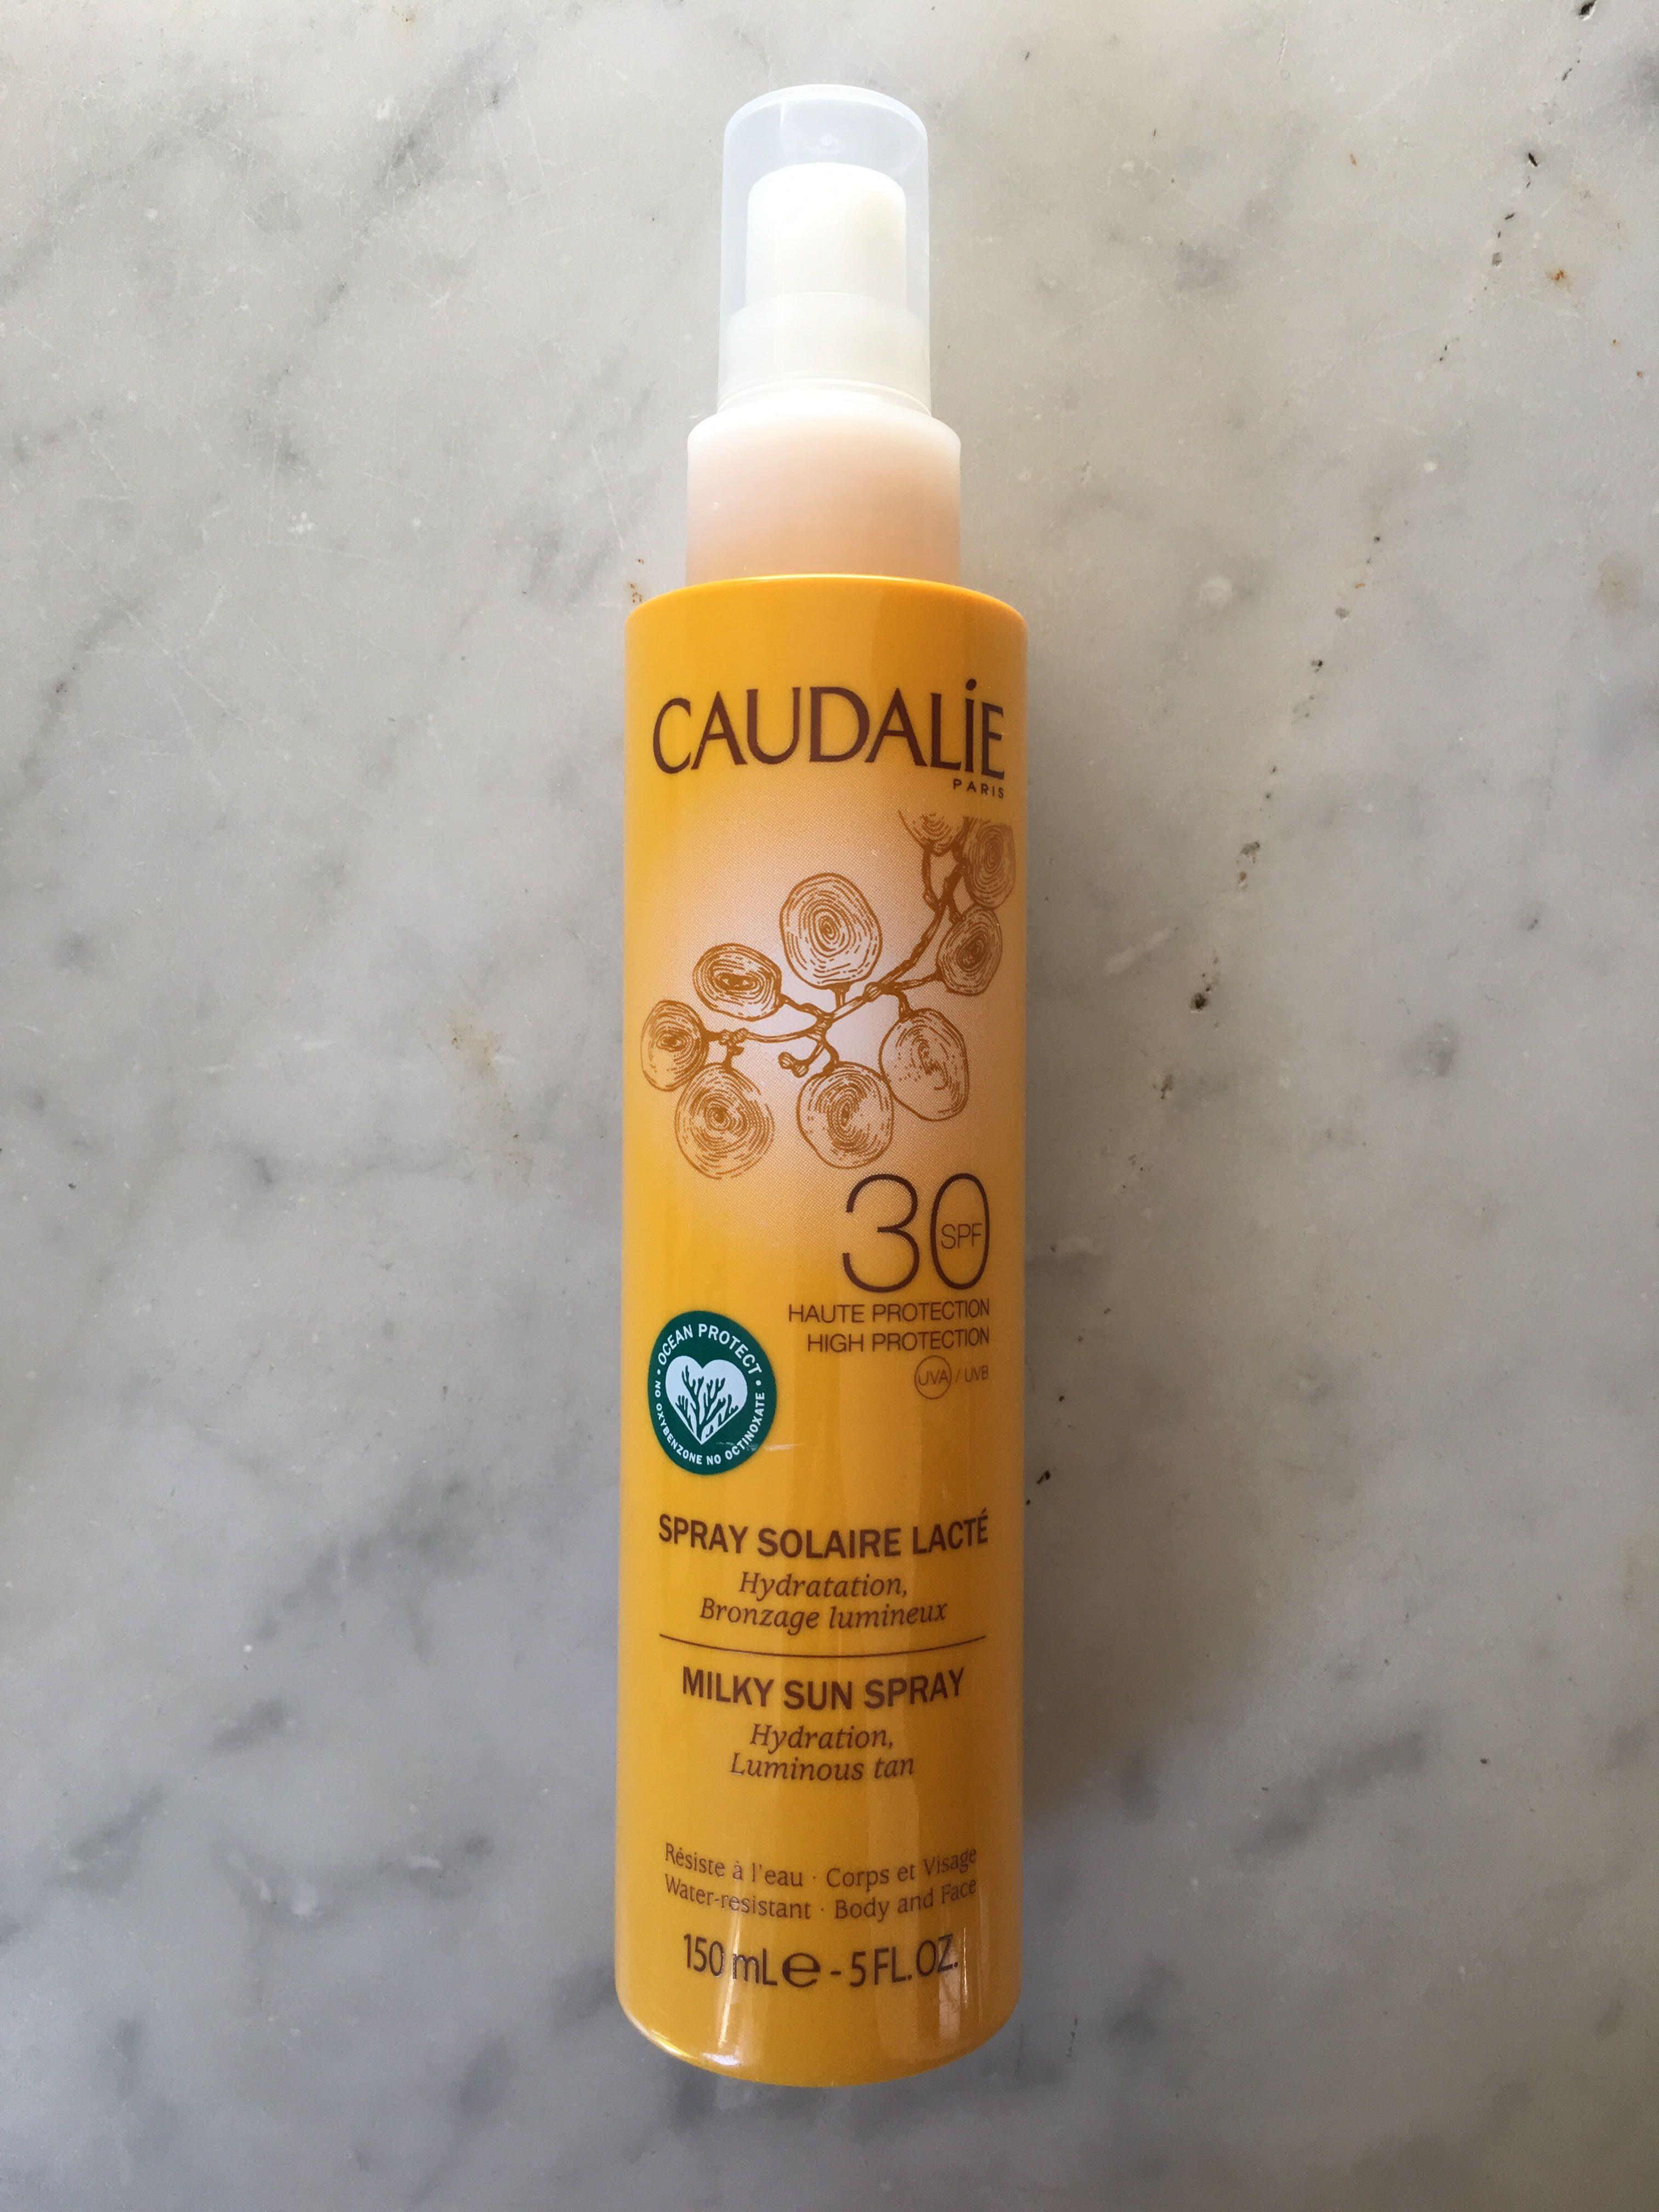 Spray solaire lacté - Product - fr